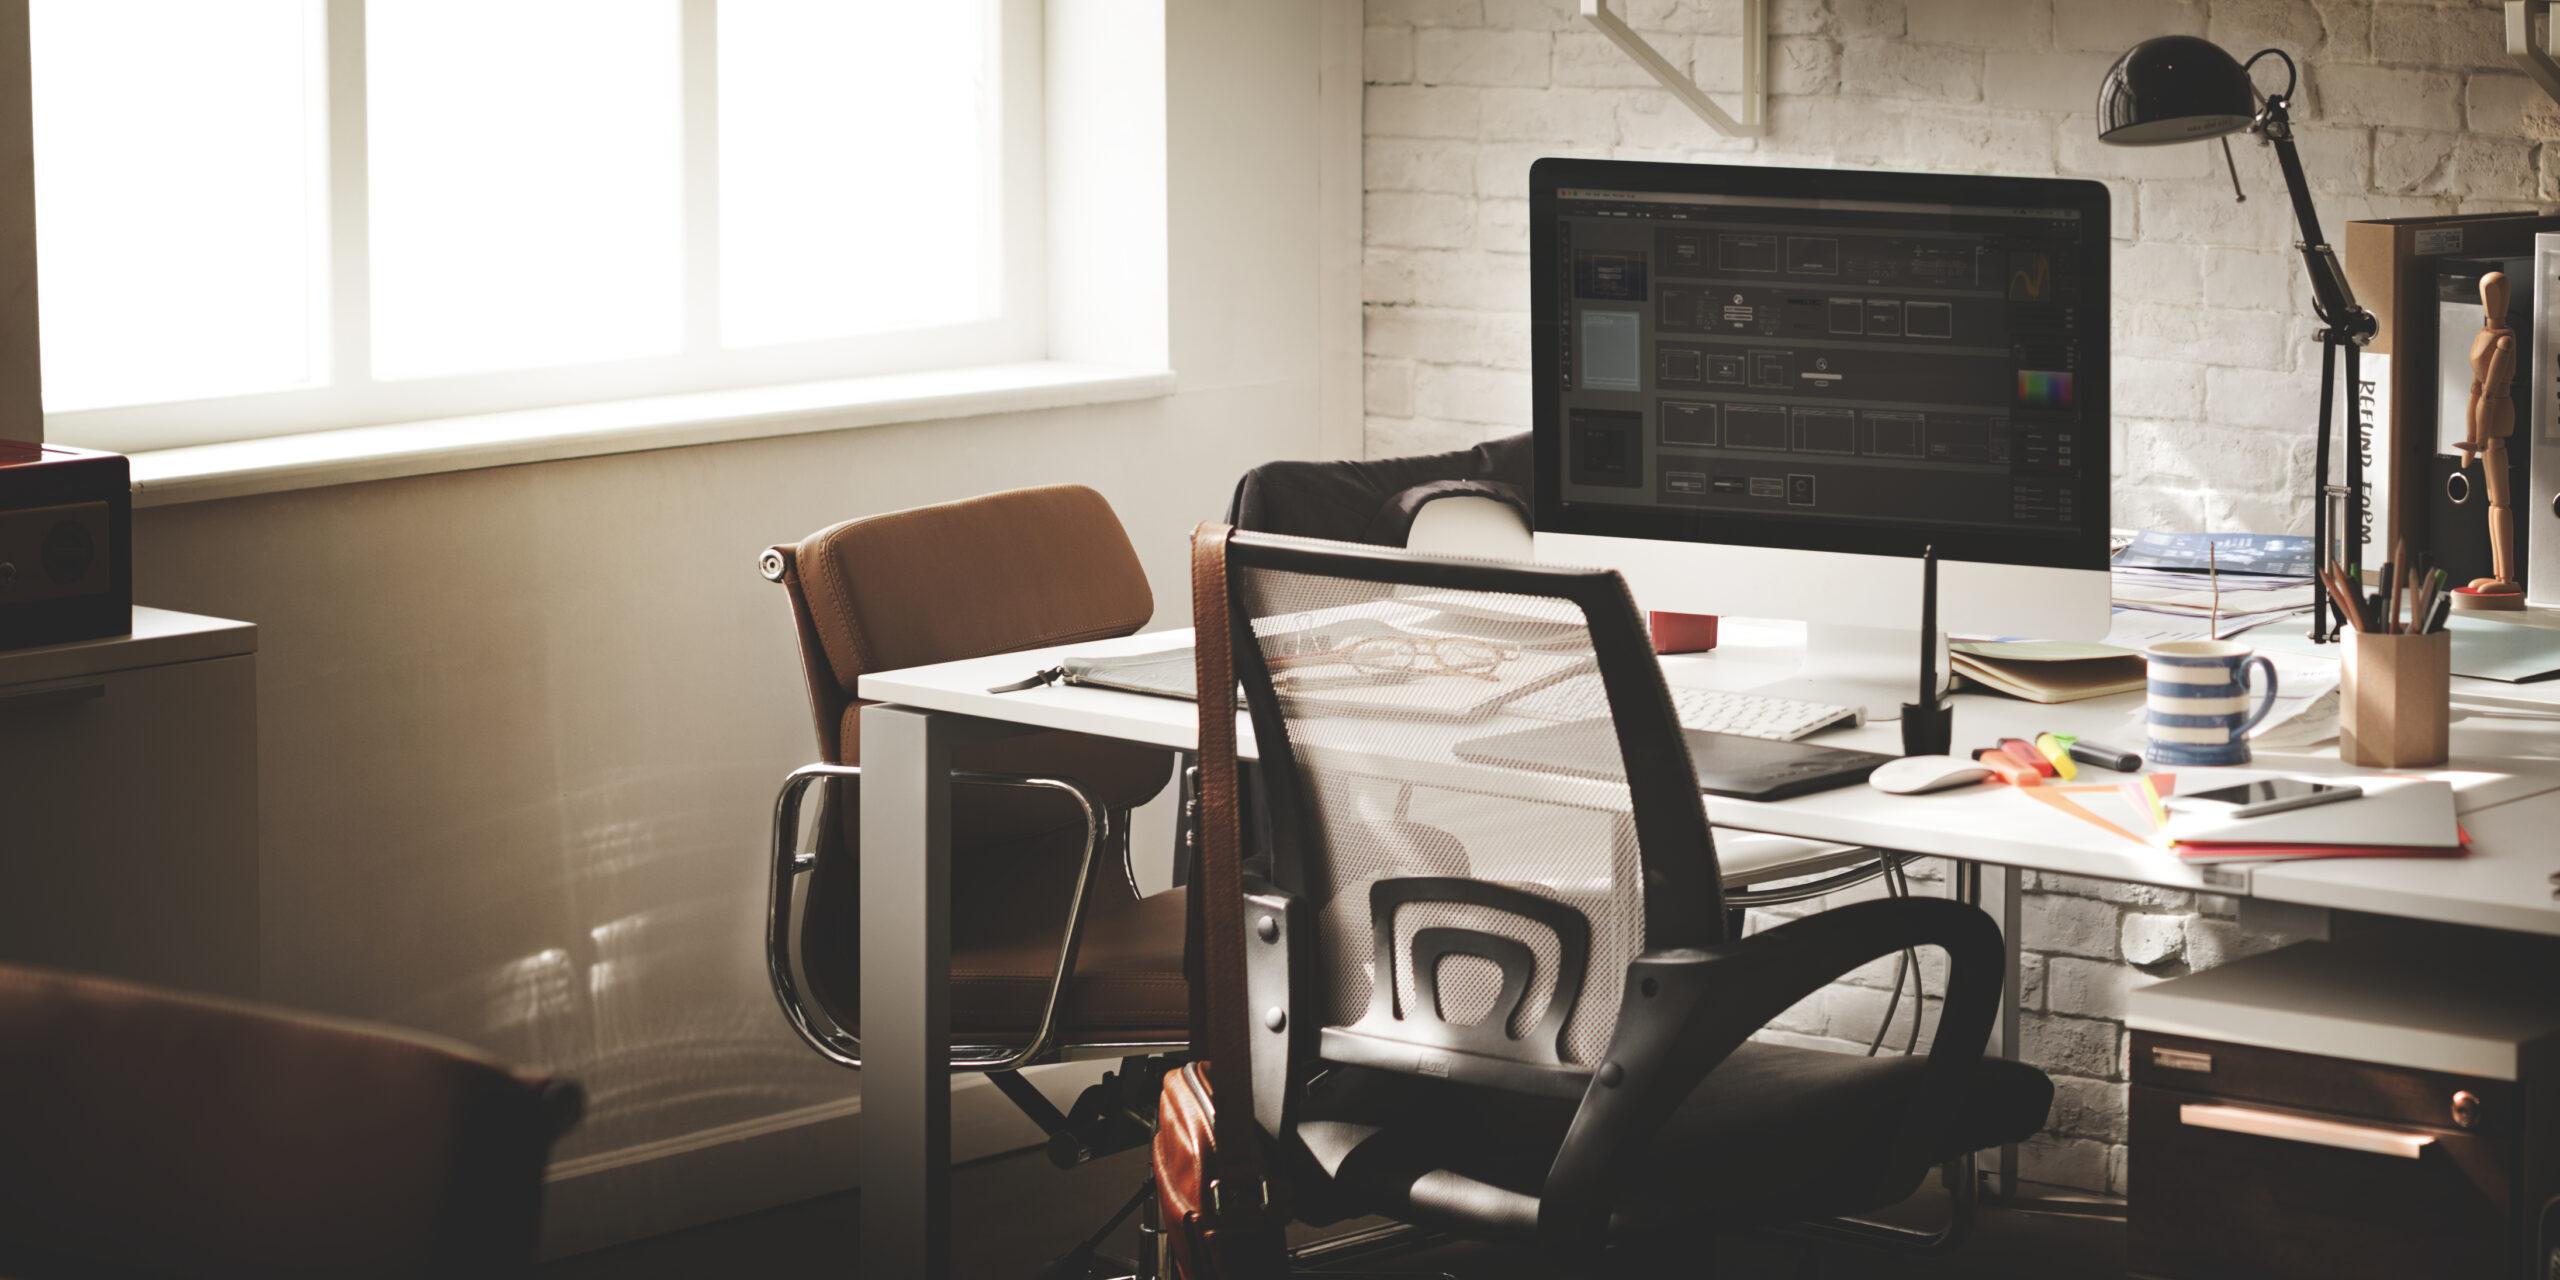 Webデザイン周辺機器|おすすめ昇降式デスク